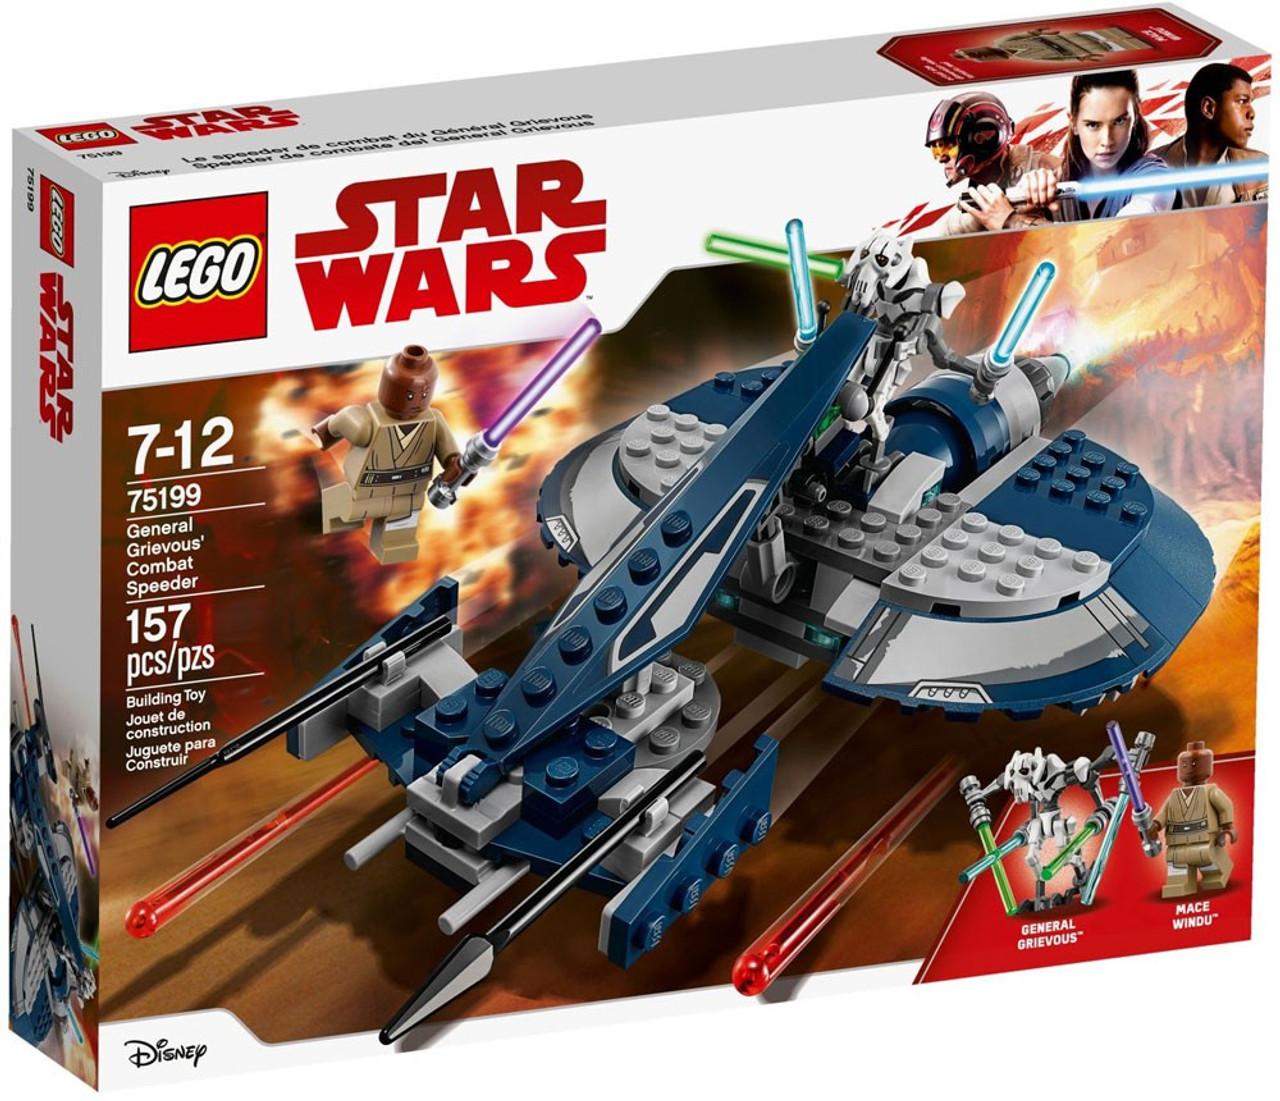 Lego Star Wars General Grievous Combat Sder Set 75199